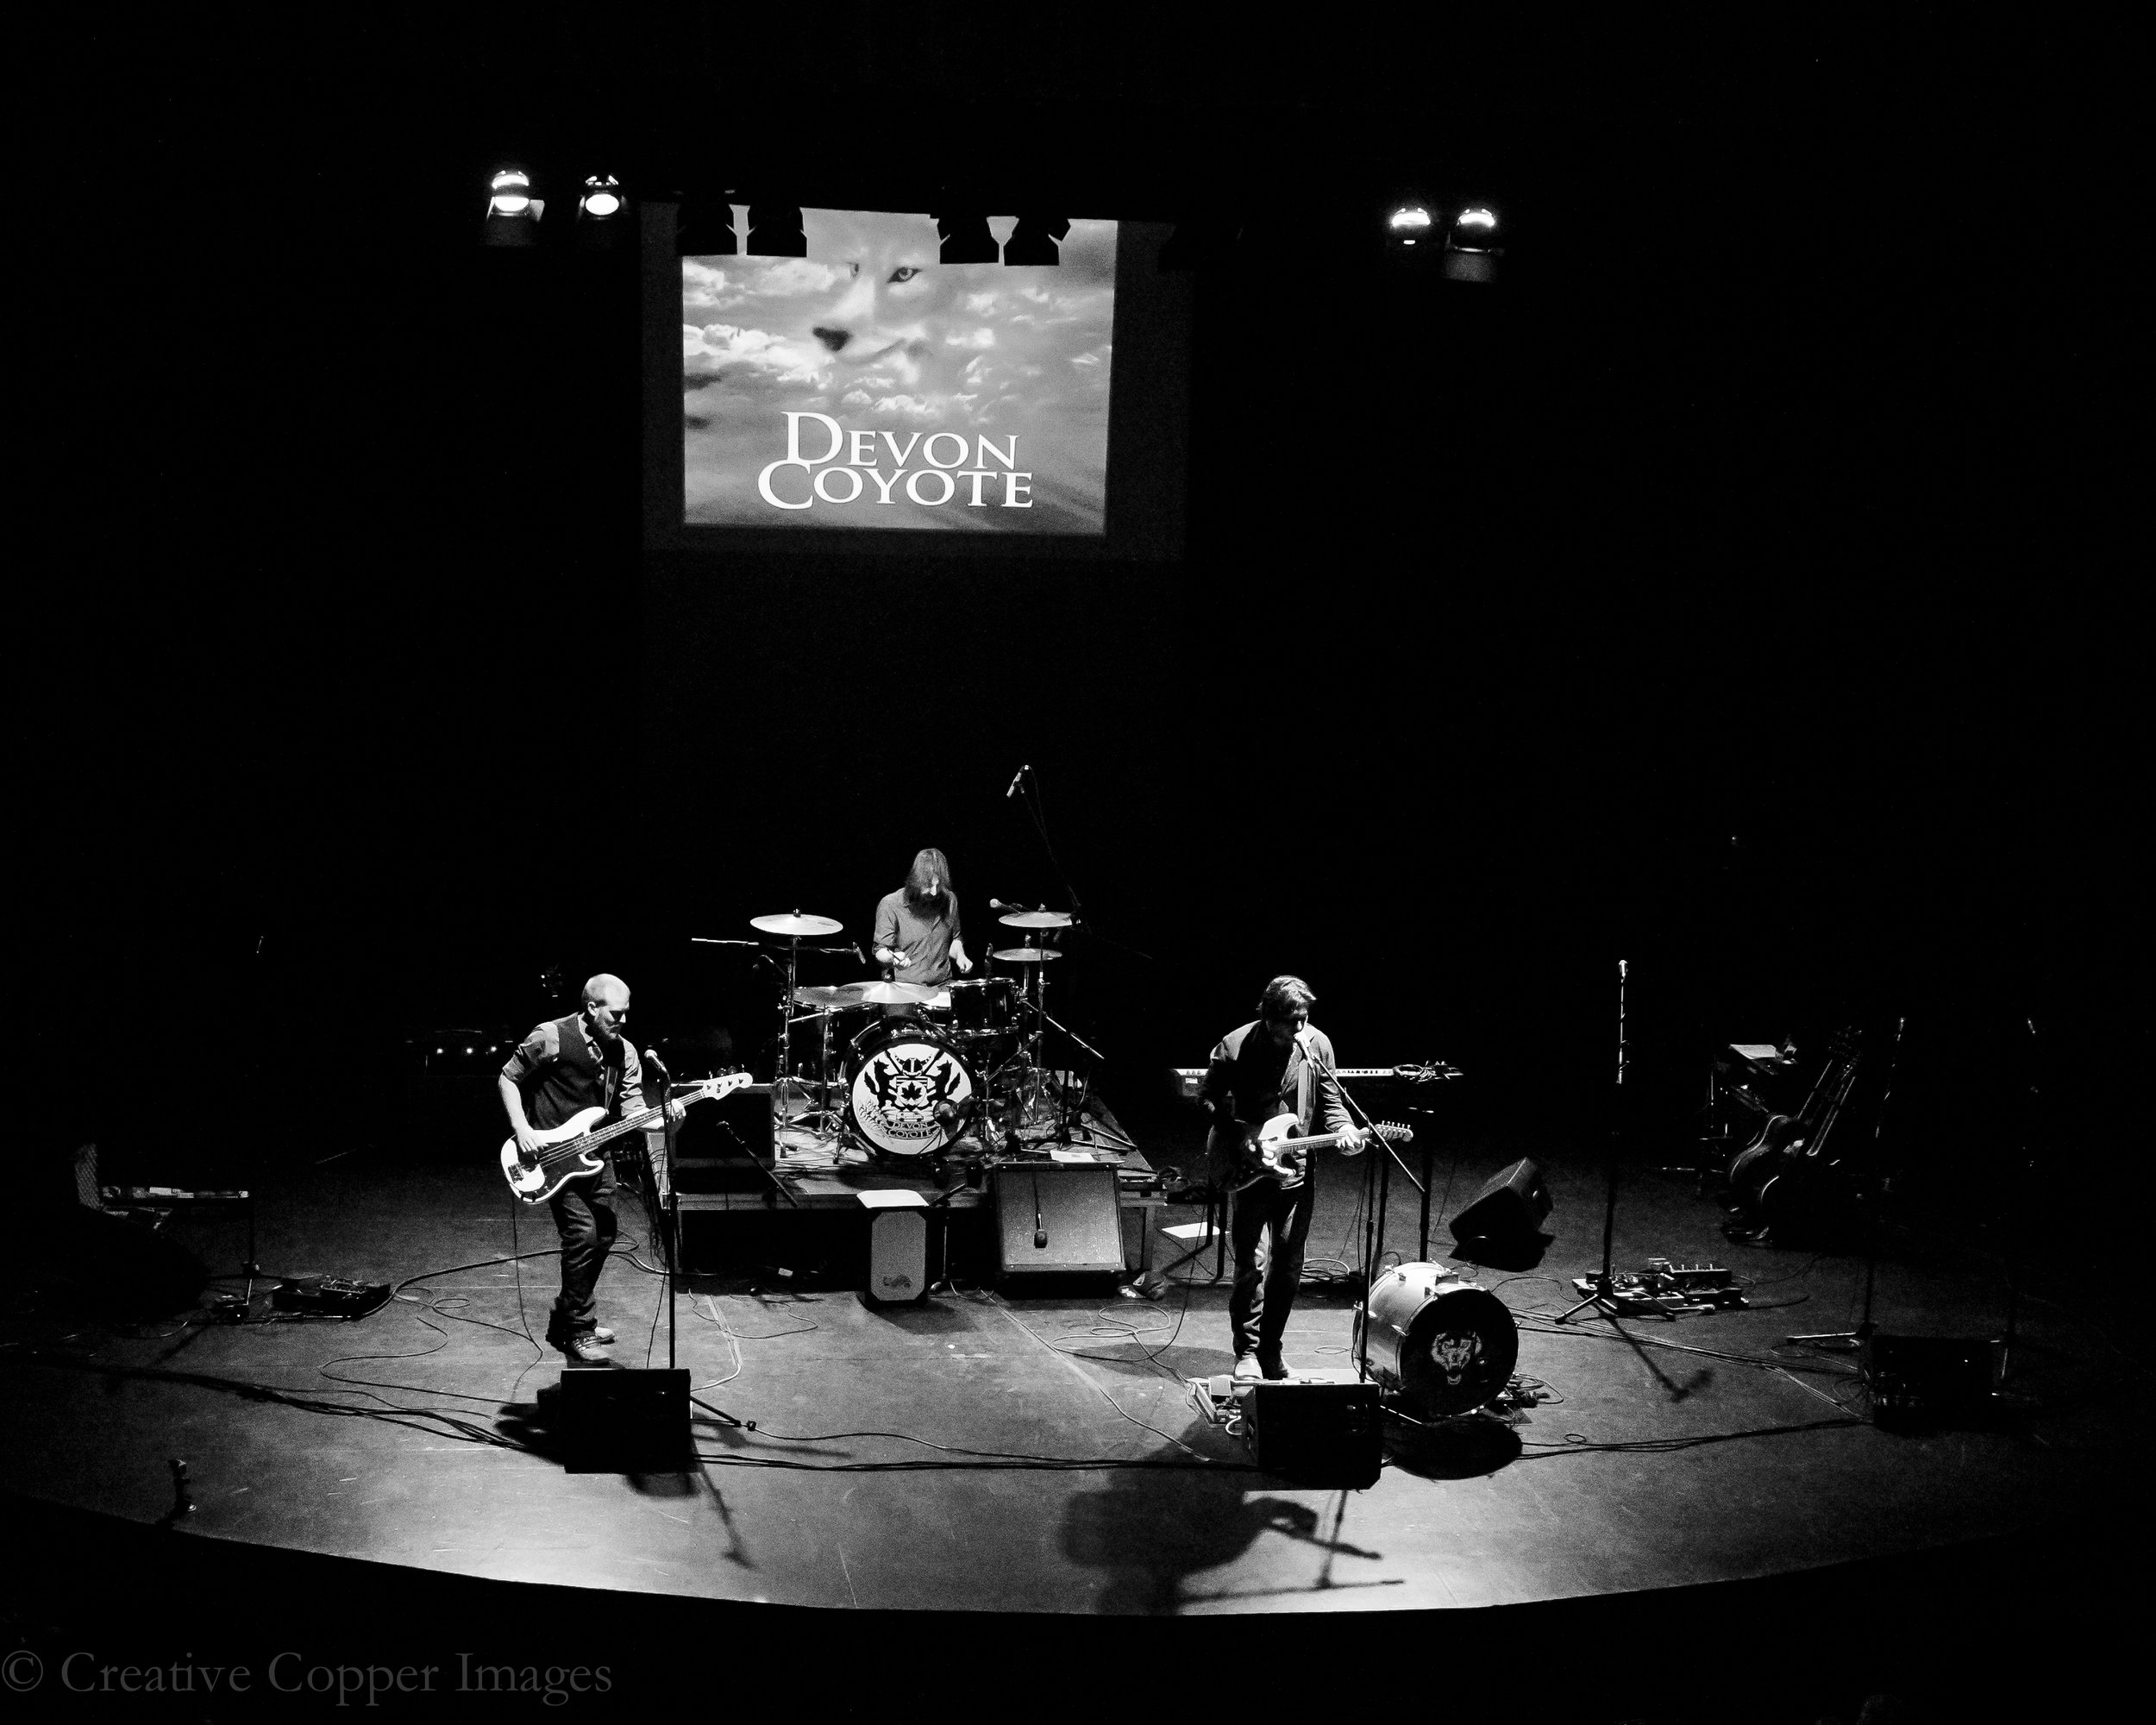 Devon Coyote Live.jpg